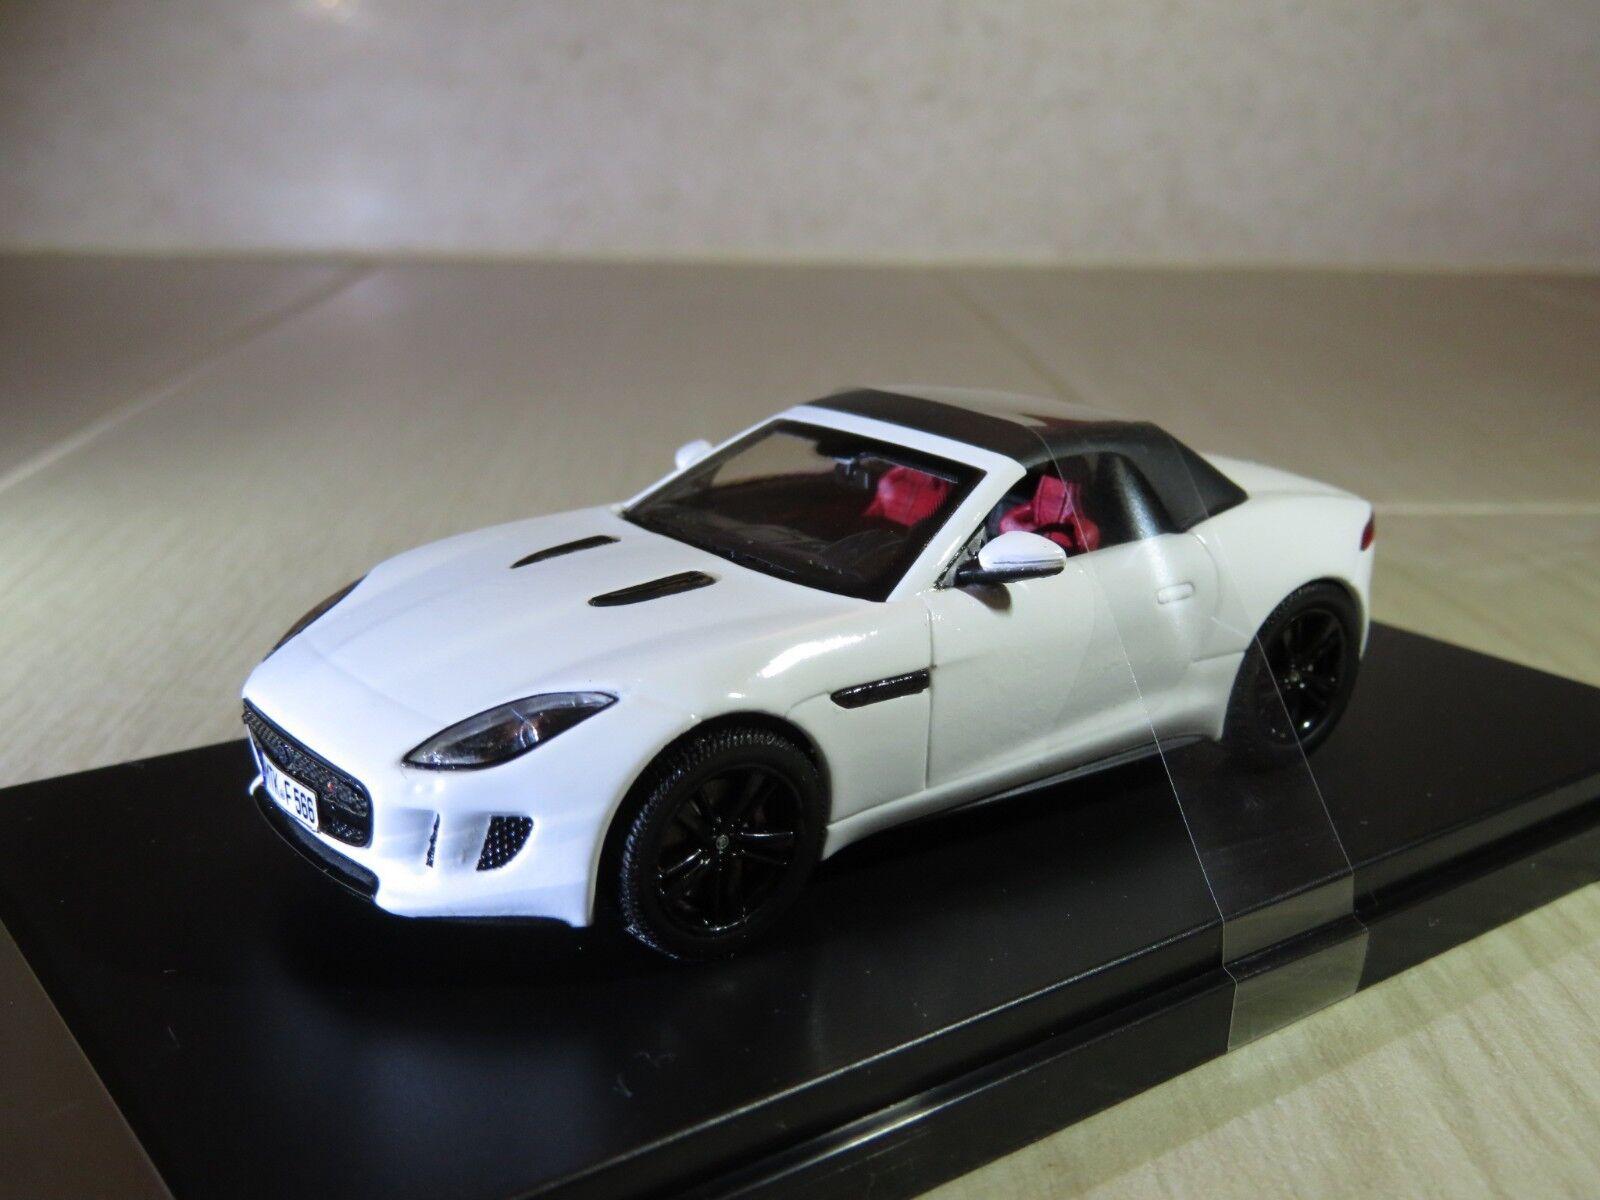 1/43 Jaguar F-TYPE V8 S soft top  2013  diecast